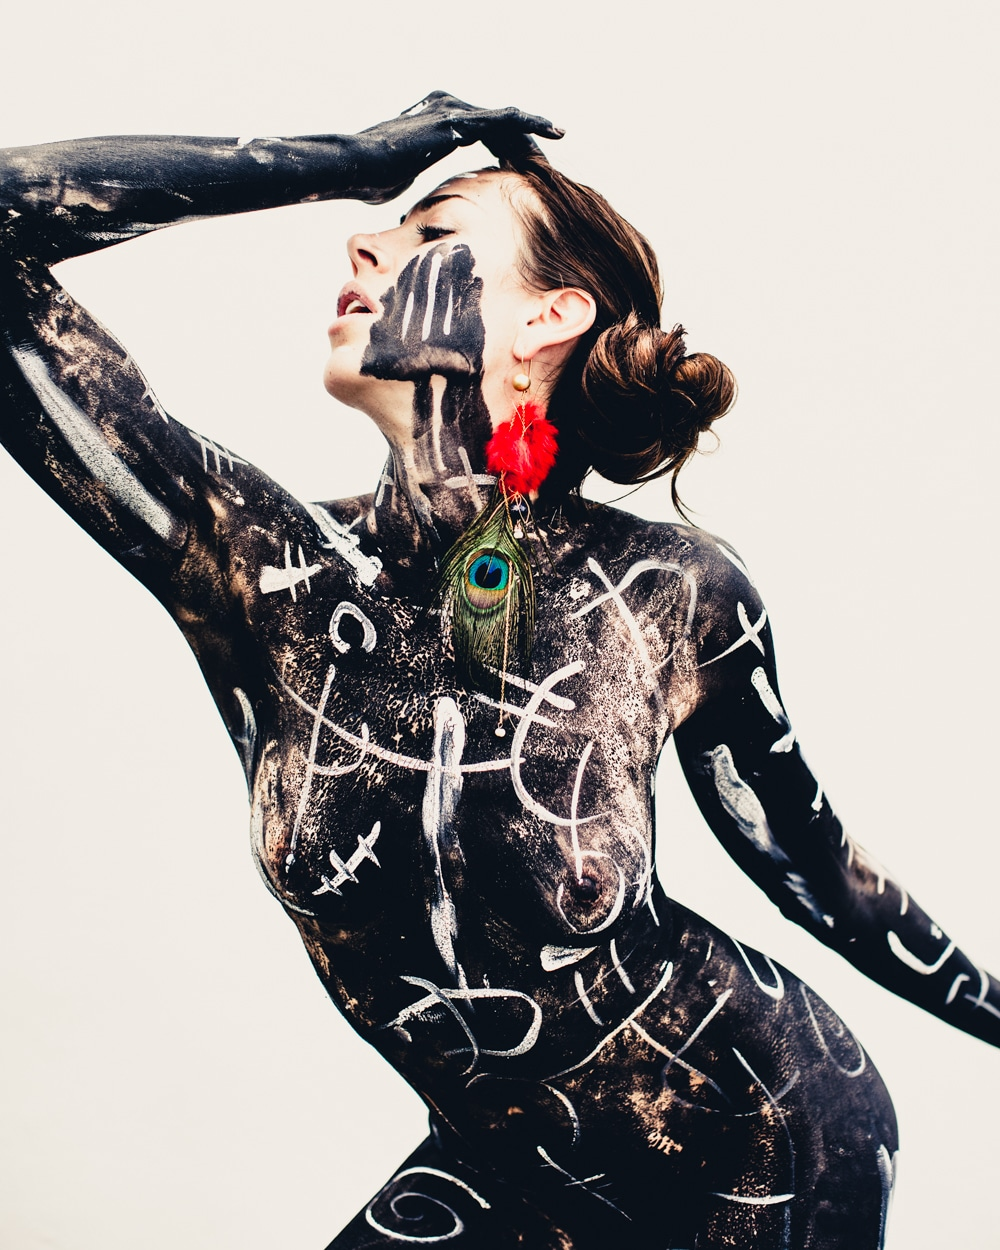 primal_fashion_by_gregory_beylerian-6